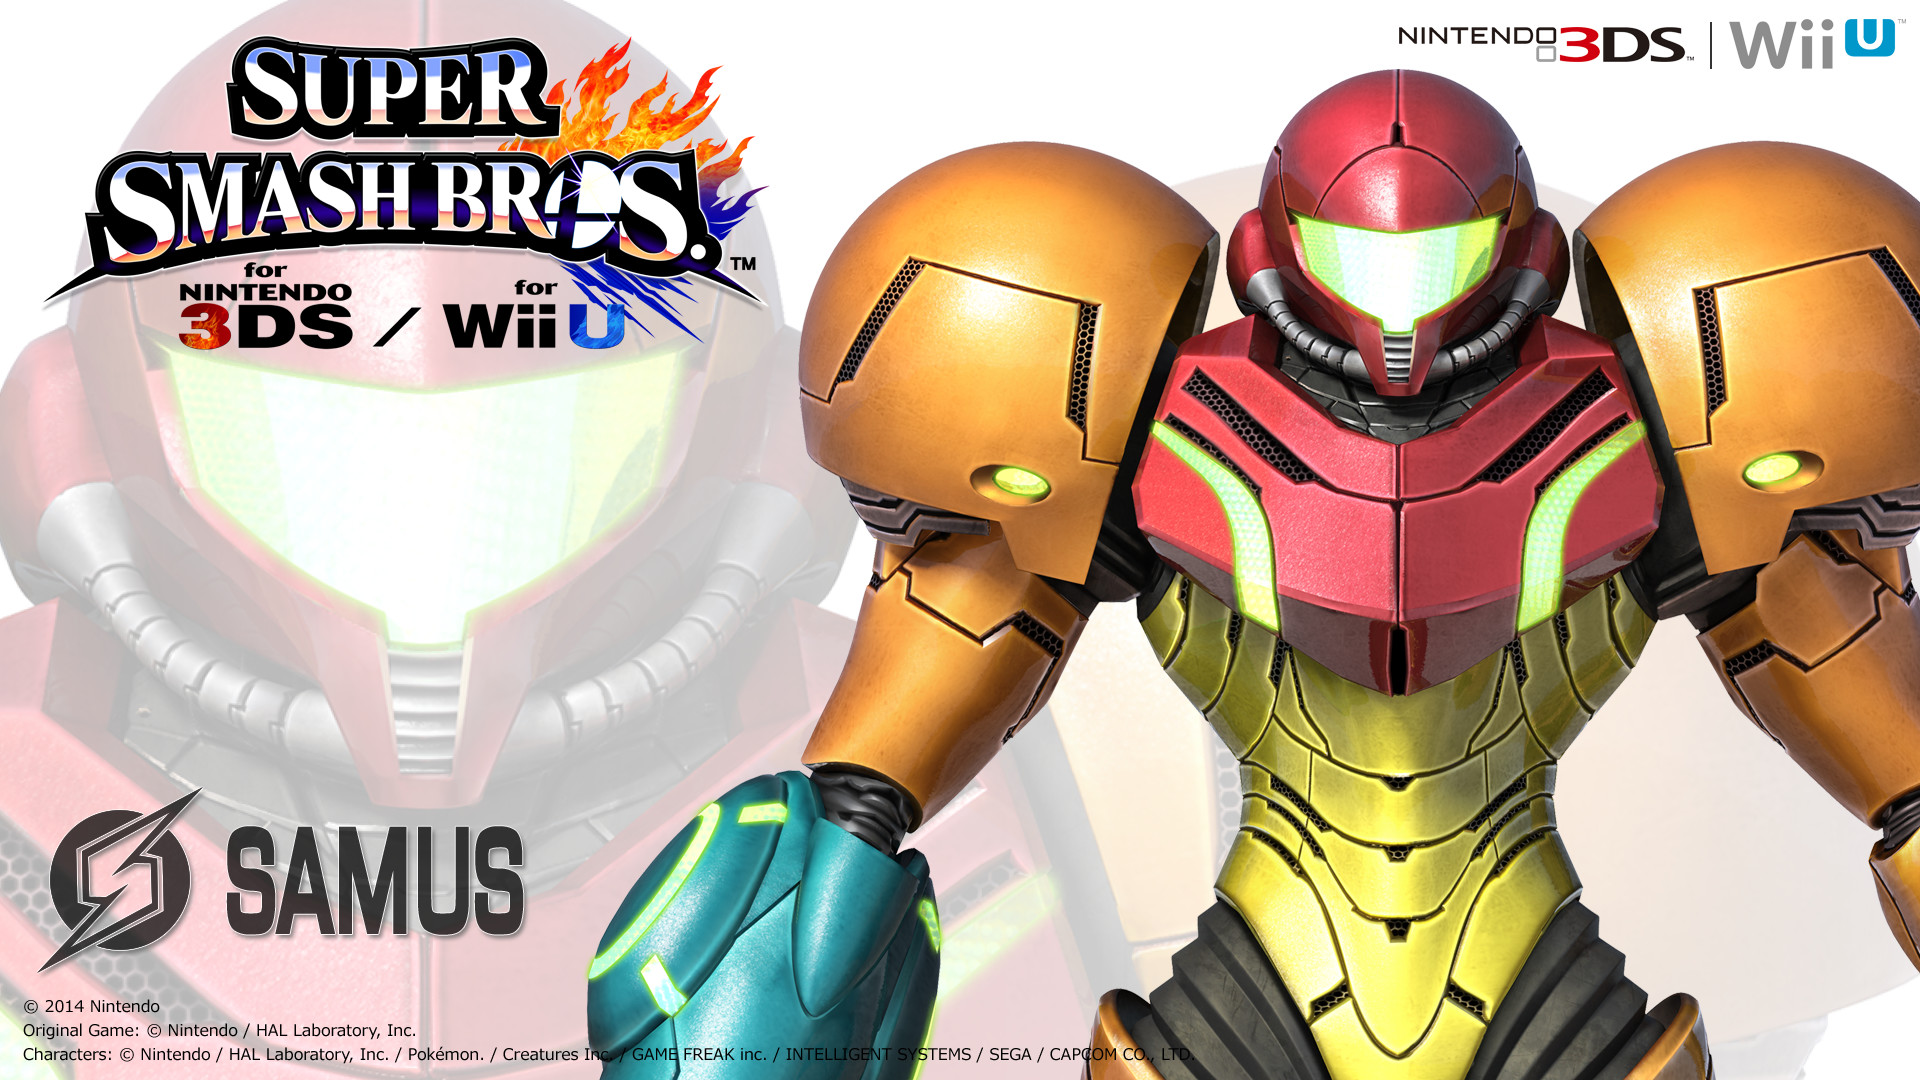 Super Smash Bros. 4: Samus Wallpaper by MasterEnex on deviantART